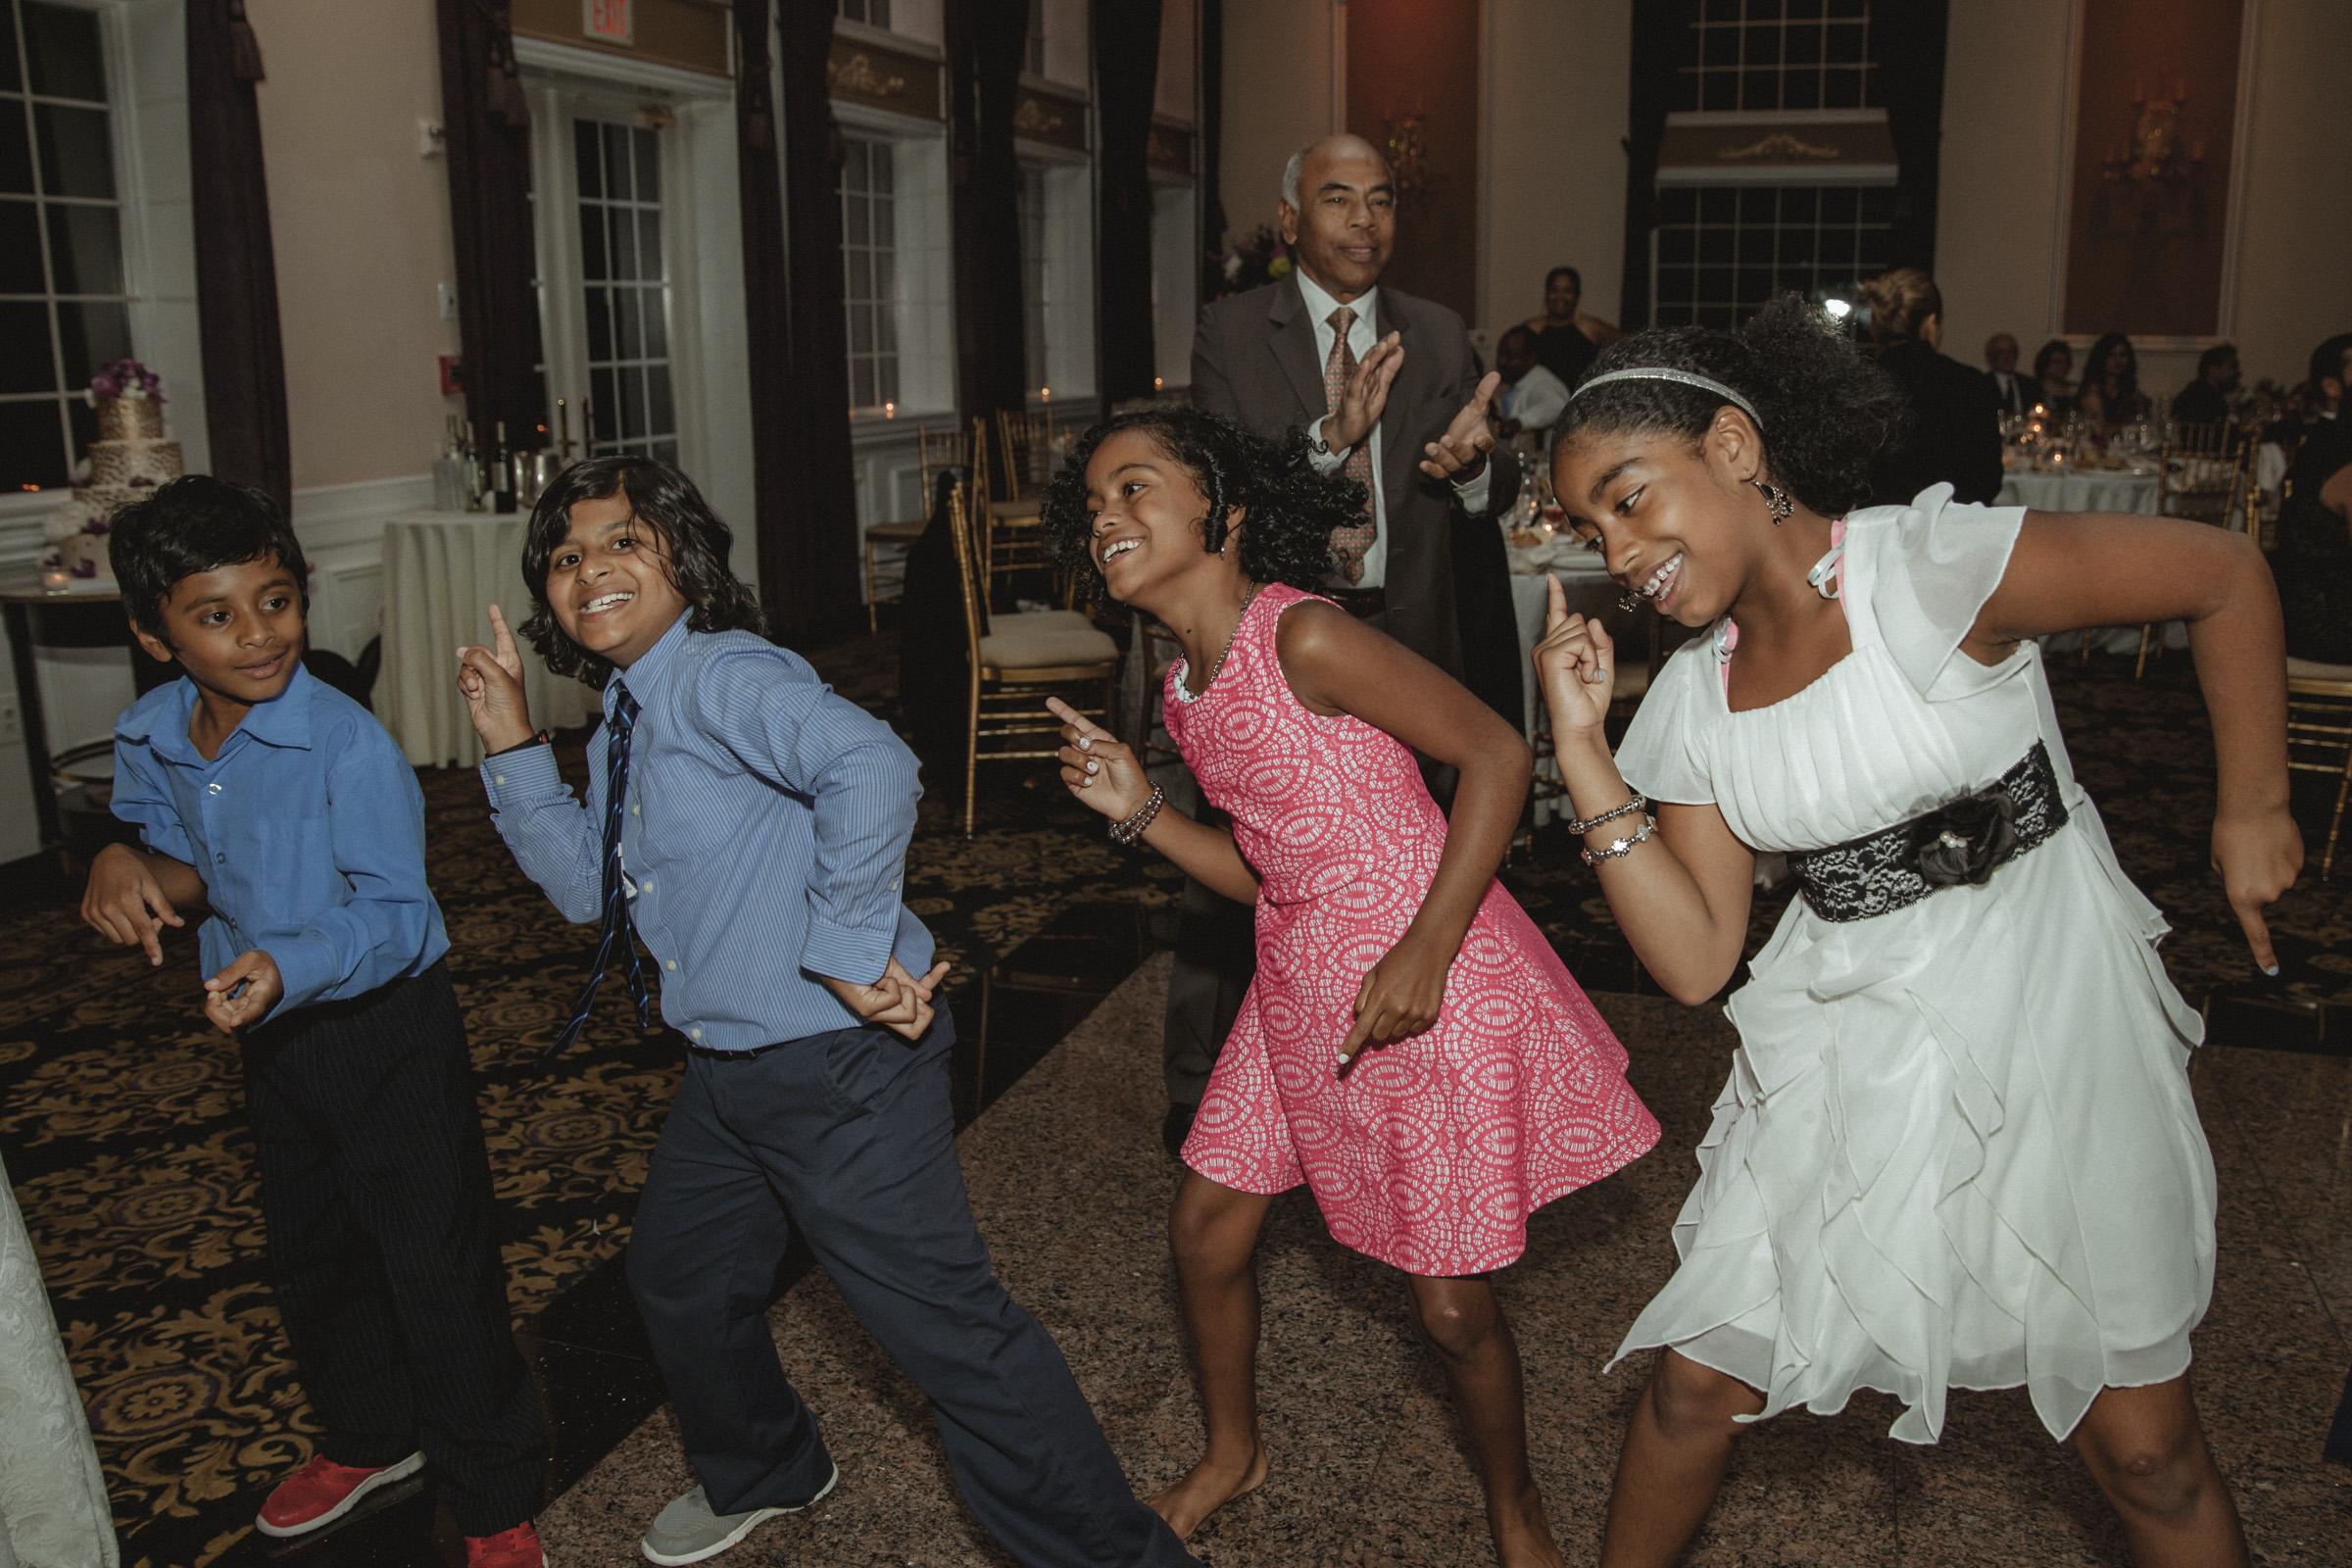 kids dancing - Estate at Florentine Gardens wedding - Hudson Valley Wedding - Kelsey & Anish's wedding - Amy Sims Photography